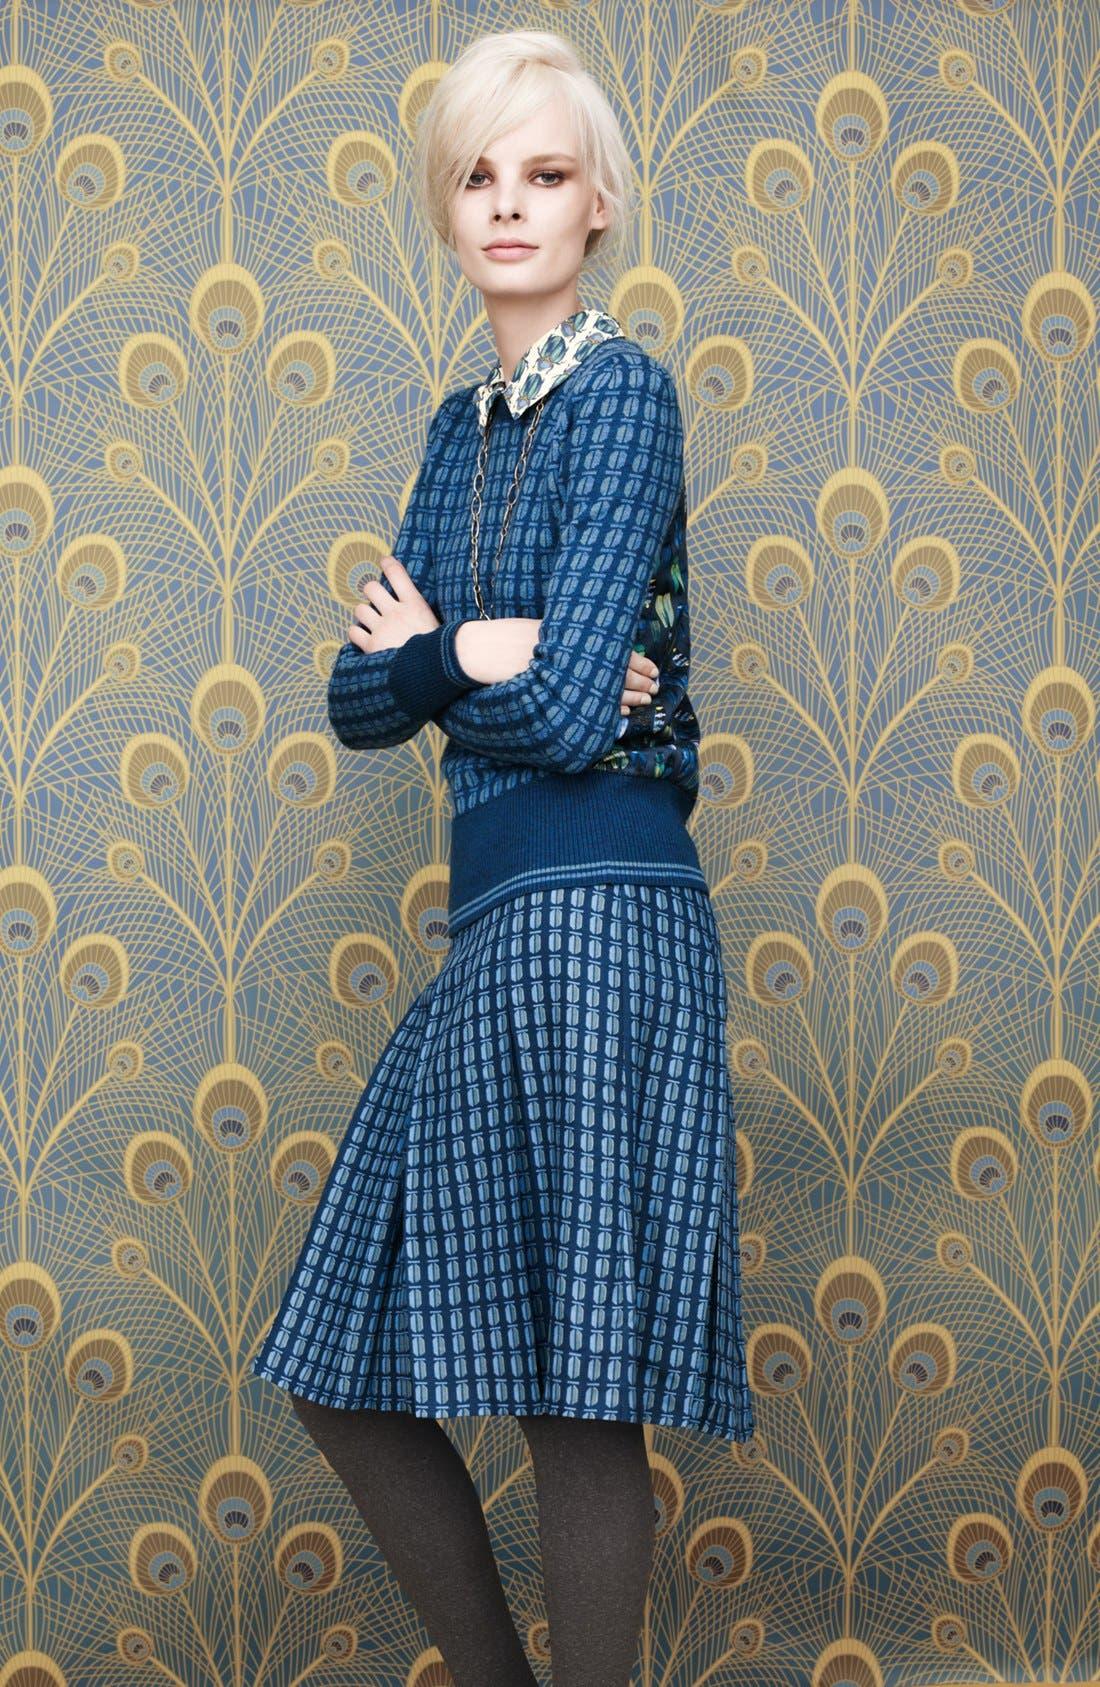 Main Image - Tory Burch Sweater, Blouse, Skirt & Pump